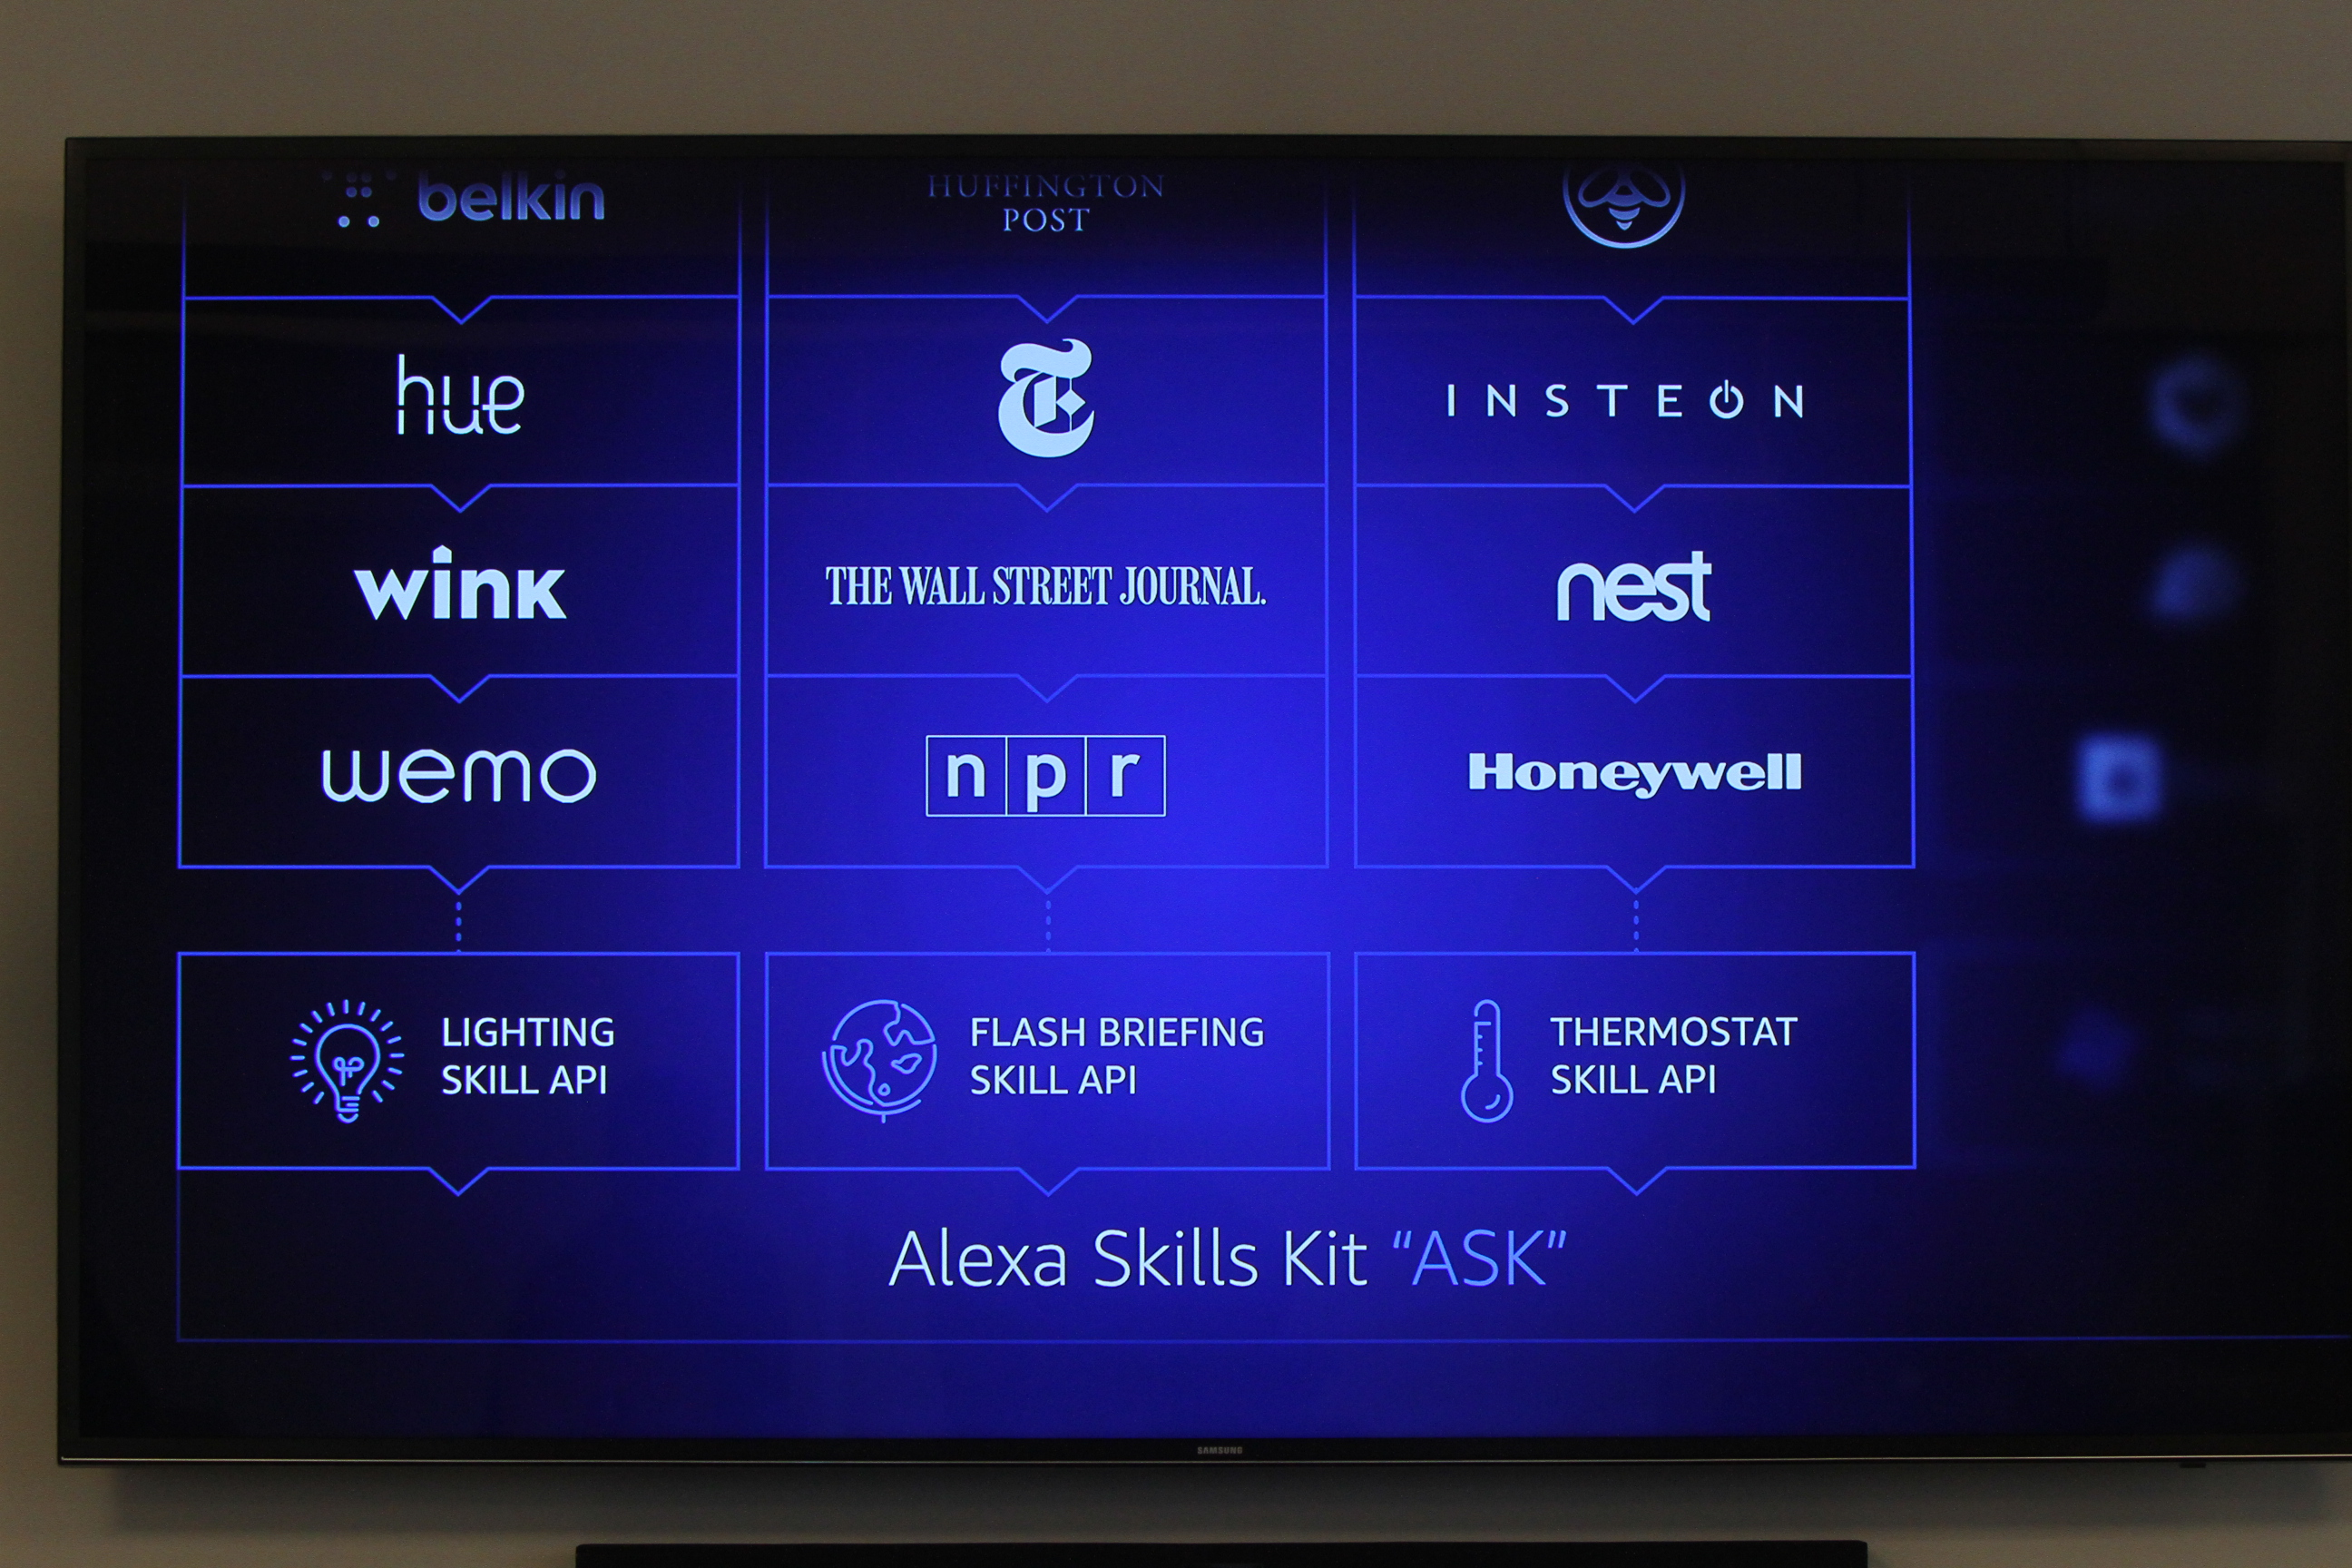 Amazon's Alexa Skills Kit